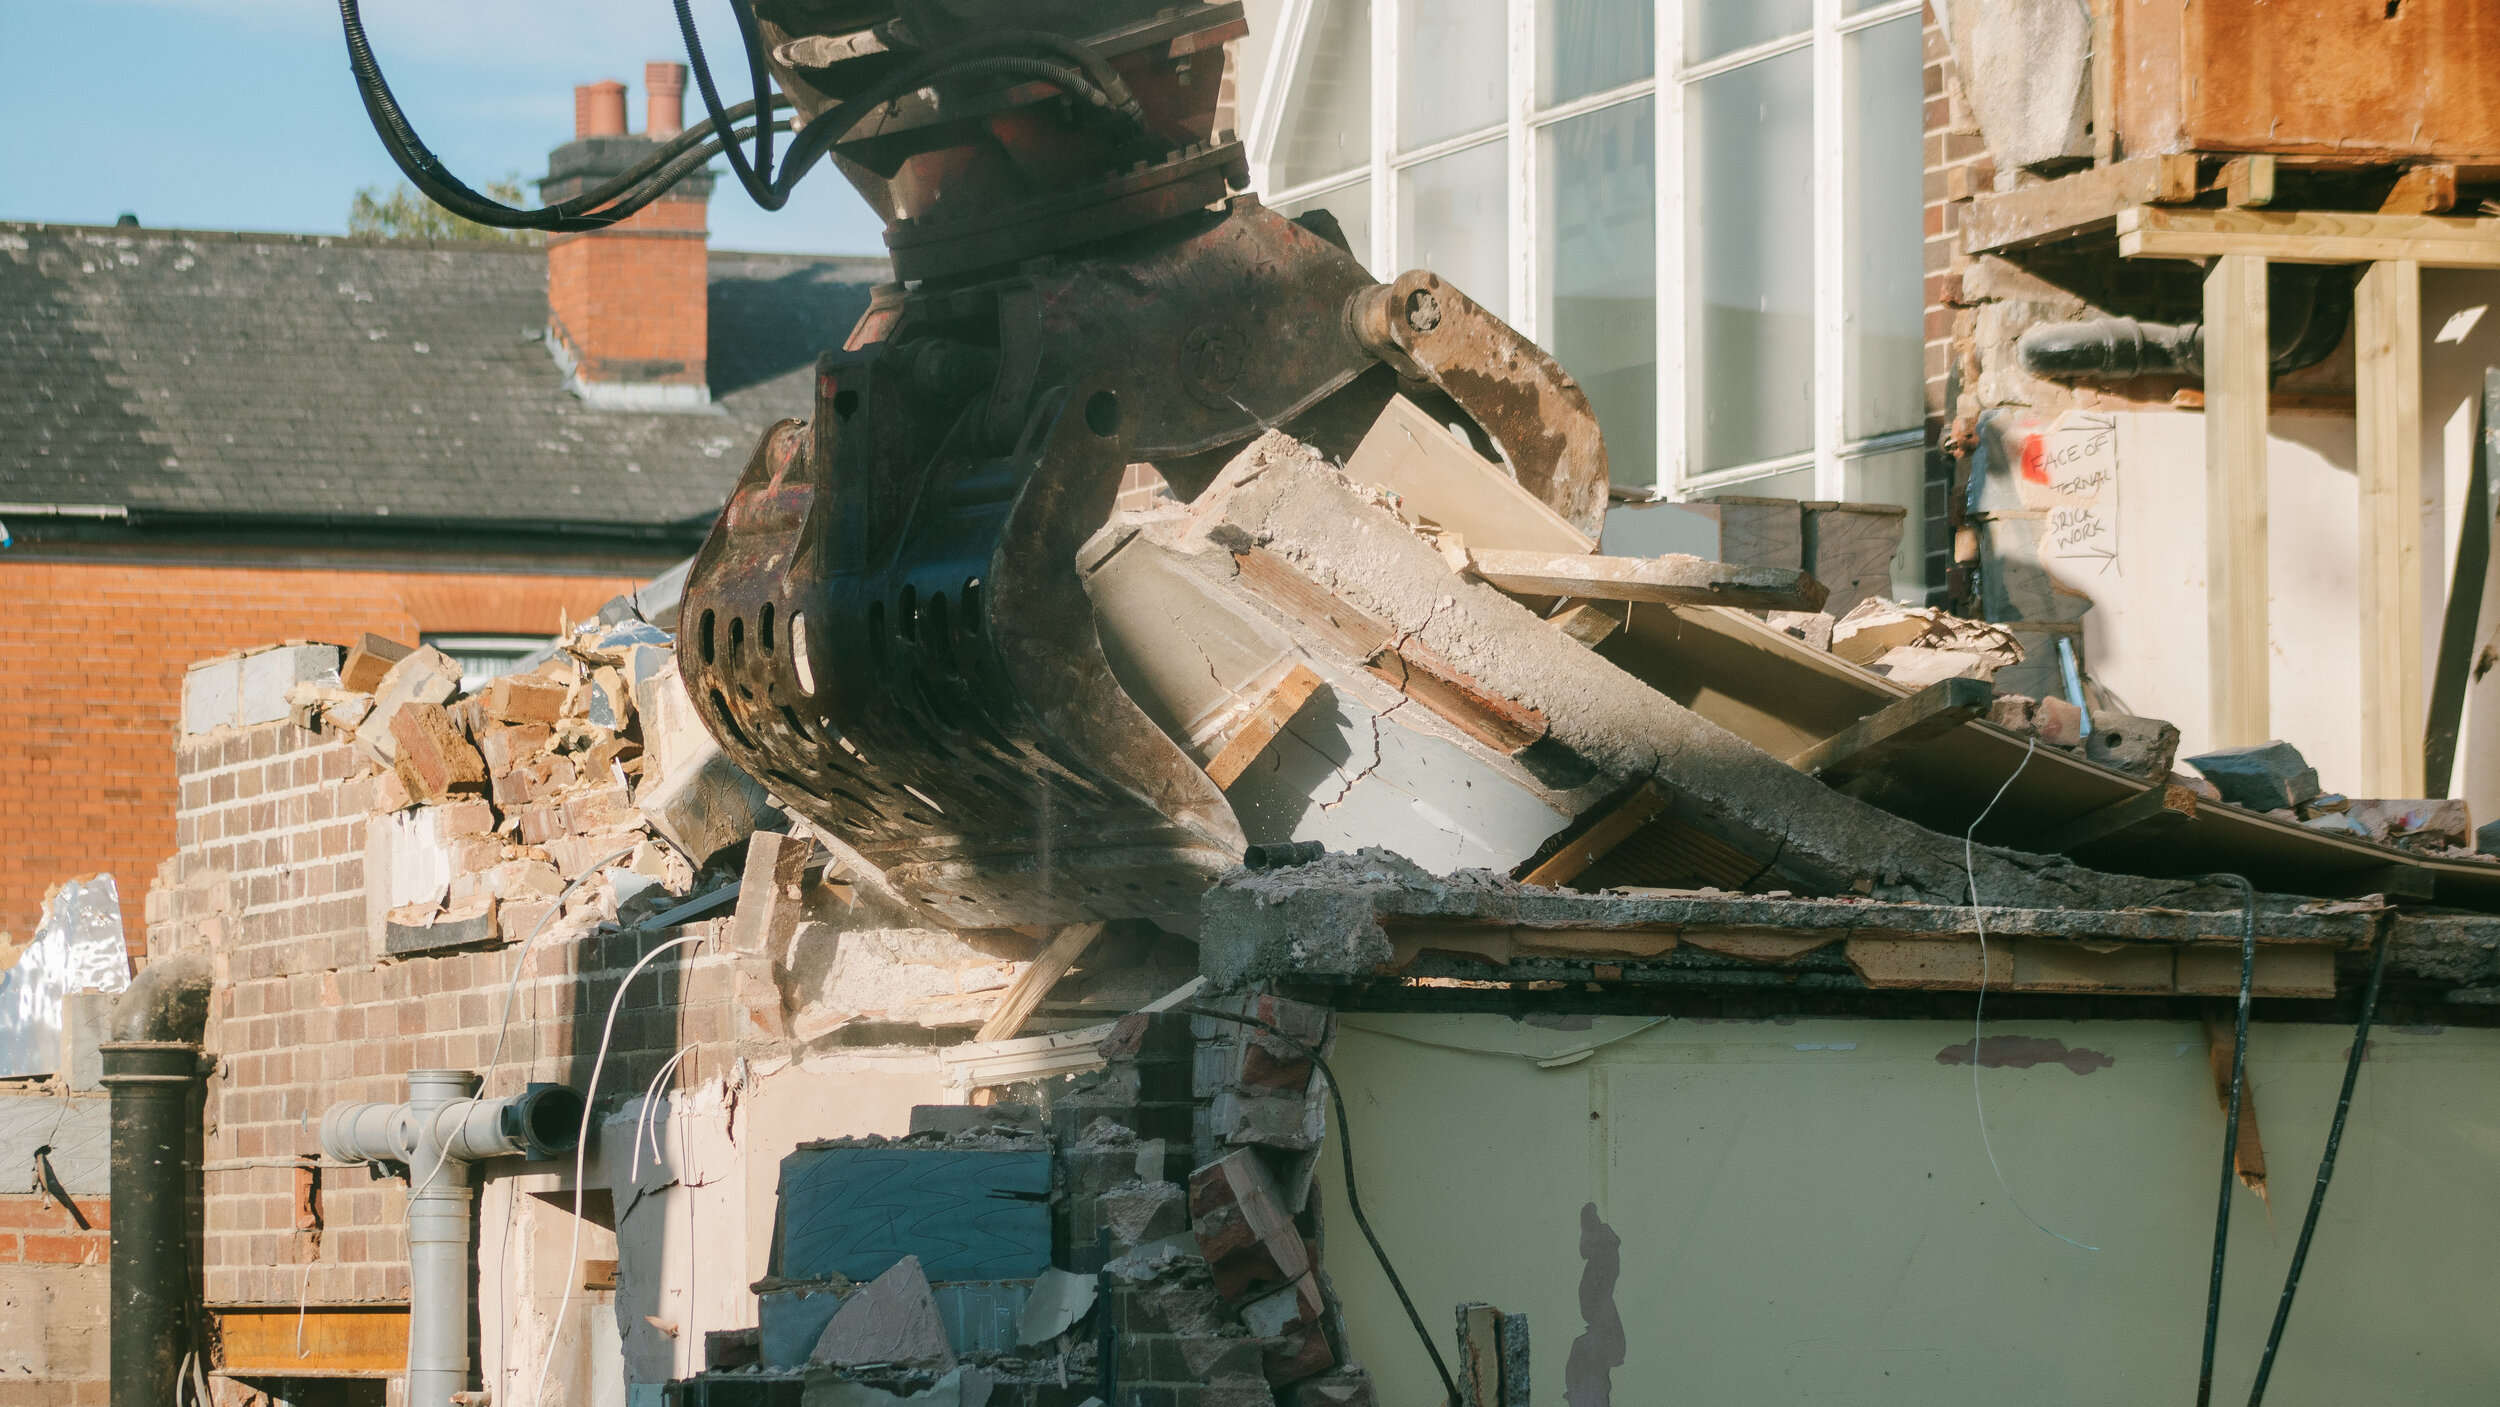 st-johns-harborne-bfm-demolition-oct-19-eo-3052-low.jpg